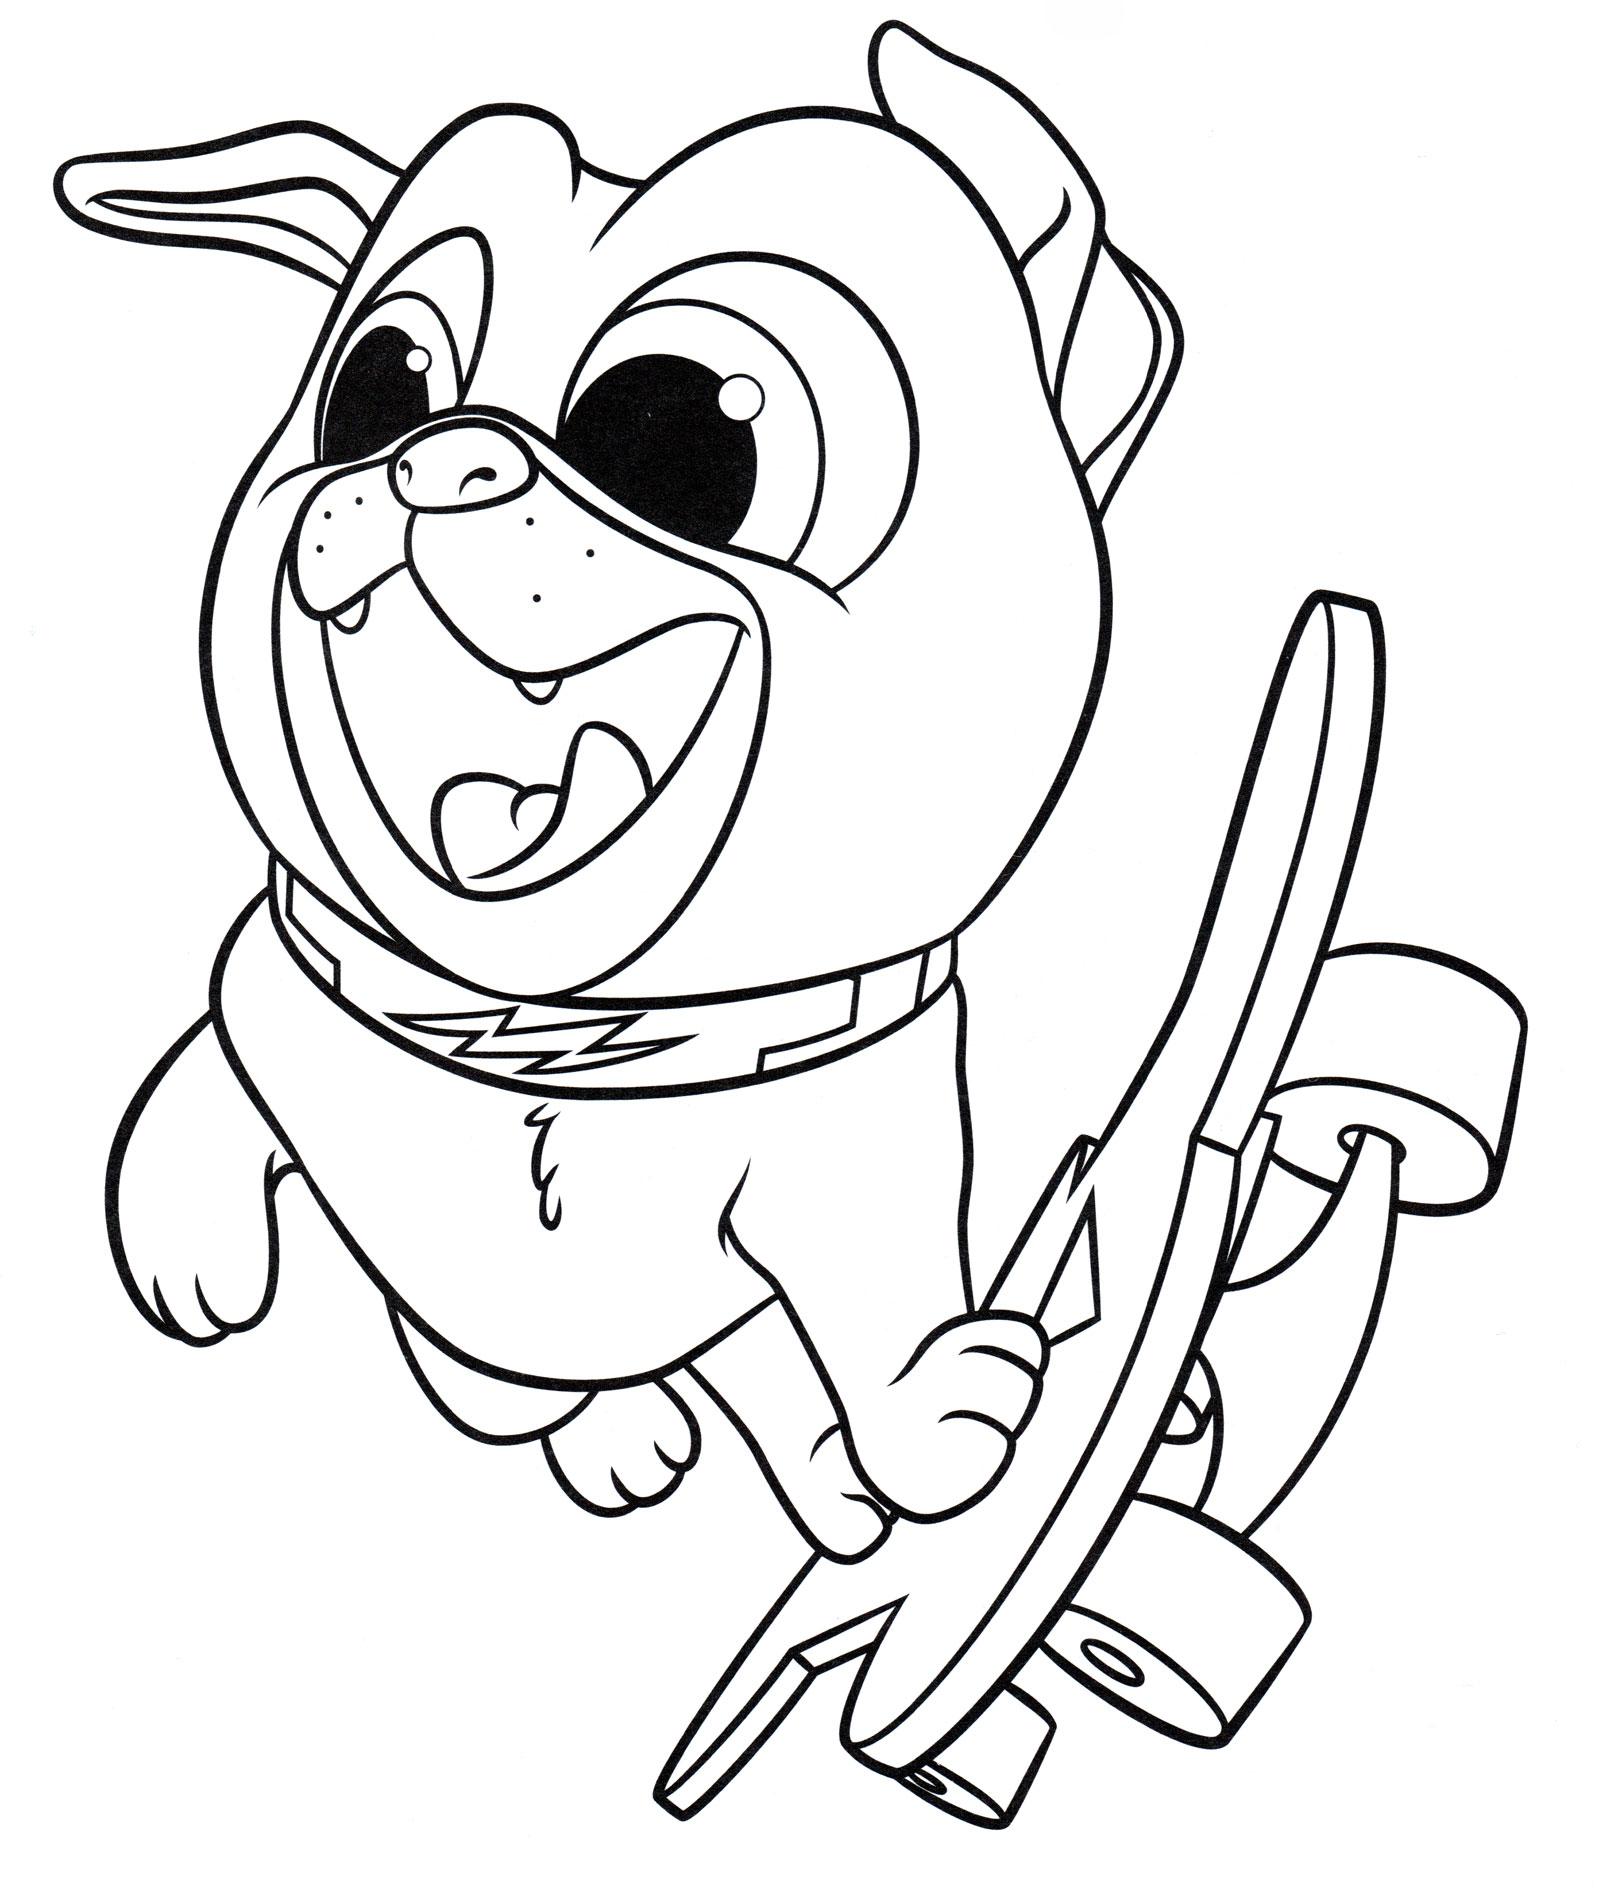 Раскраска Бинго на скейте | Раскраски Дружные мопсы